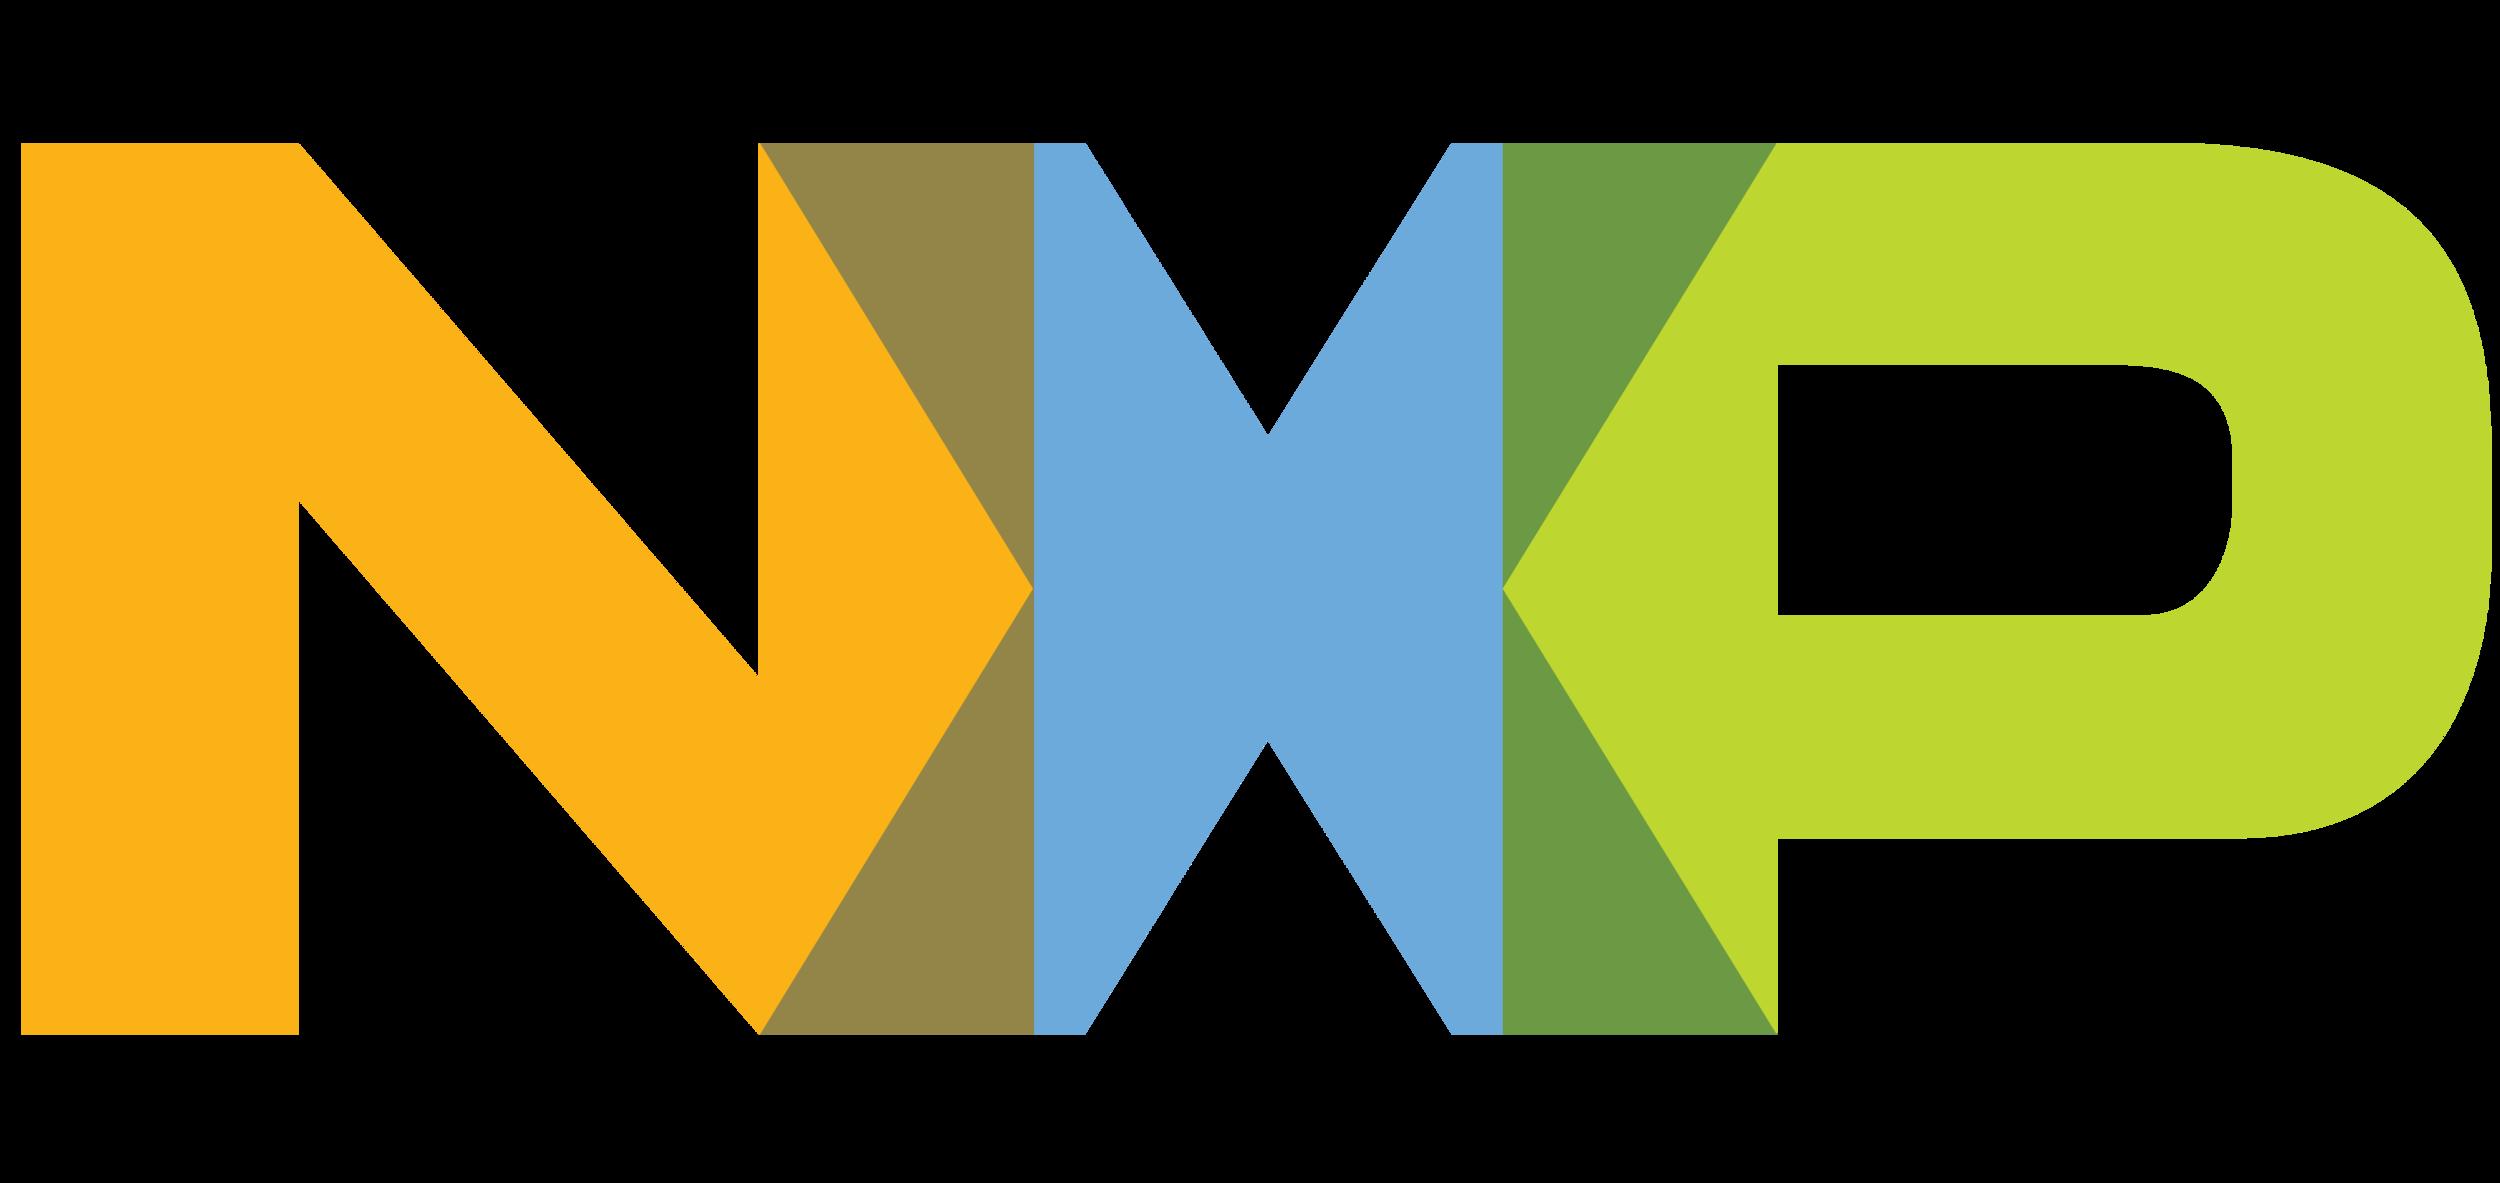 Am I Next? NXP QUALCOMM MERGER TO PREVENT BROADCOM HOSTILE TAKEOVER